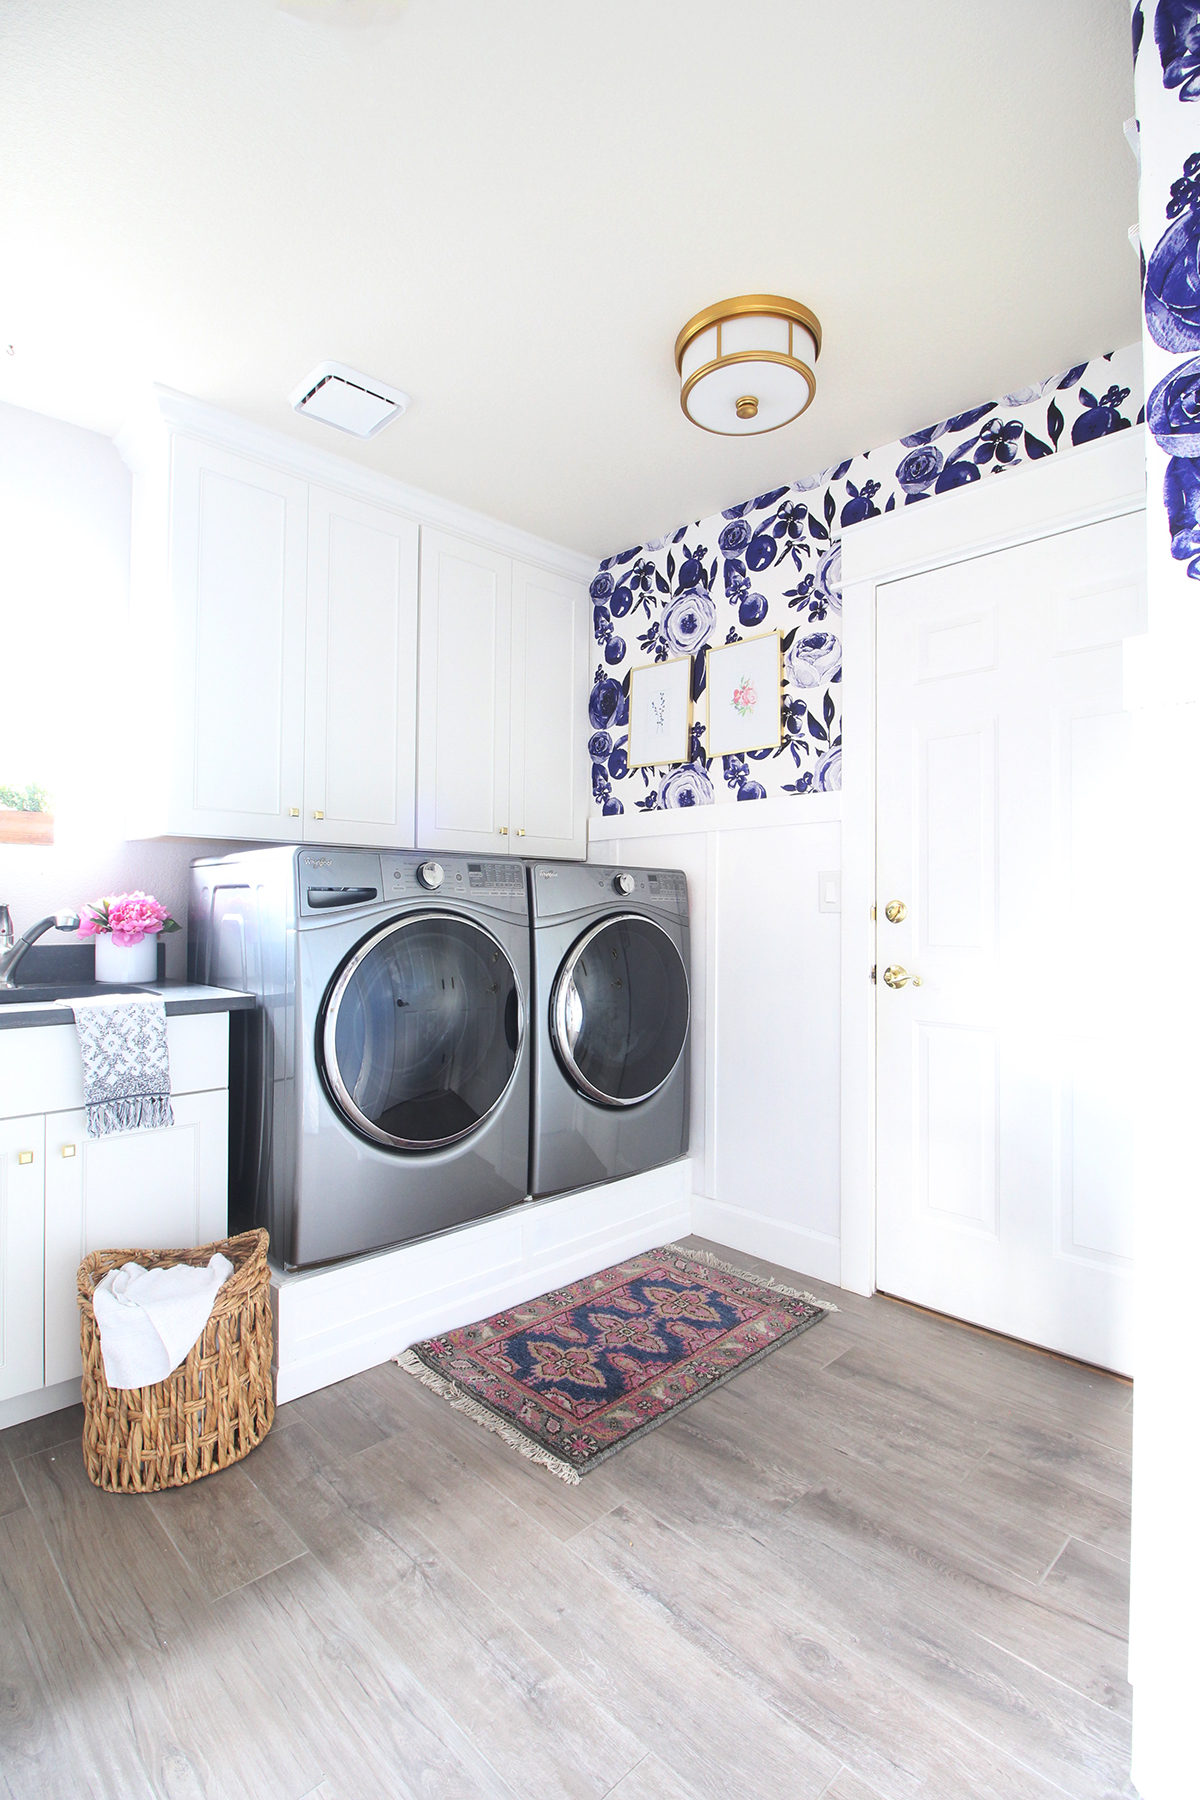 Park Home Reno Diy Laundry Pedestal Classy Clutter